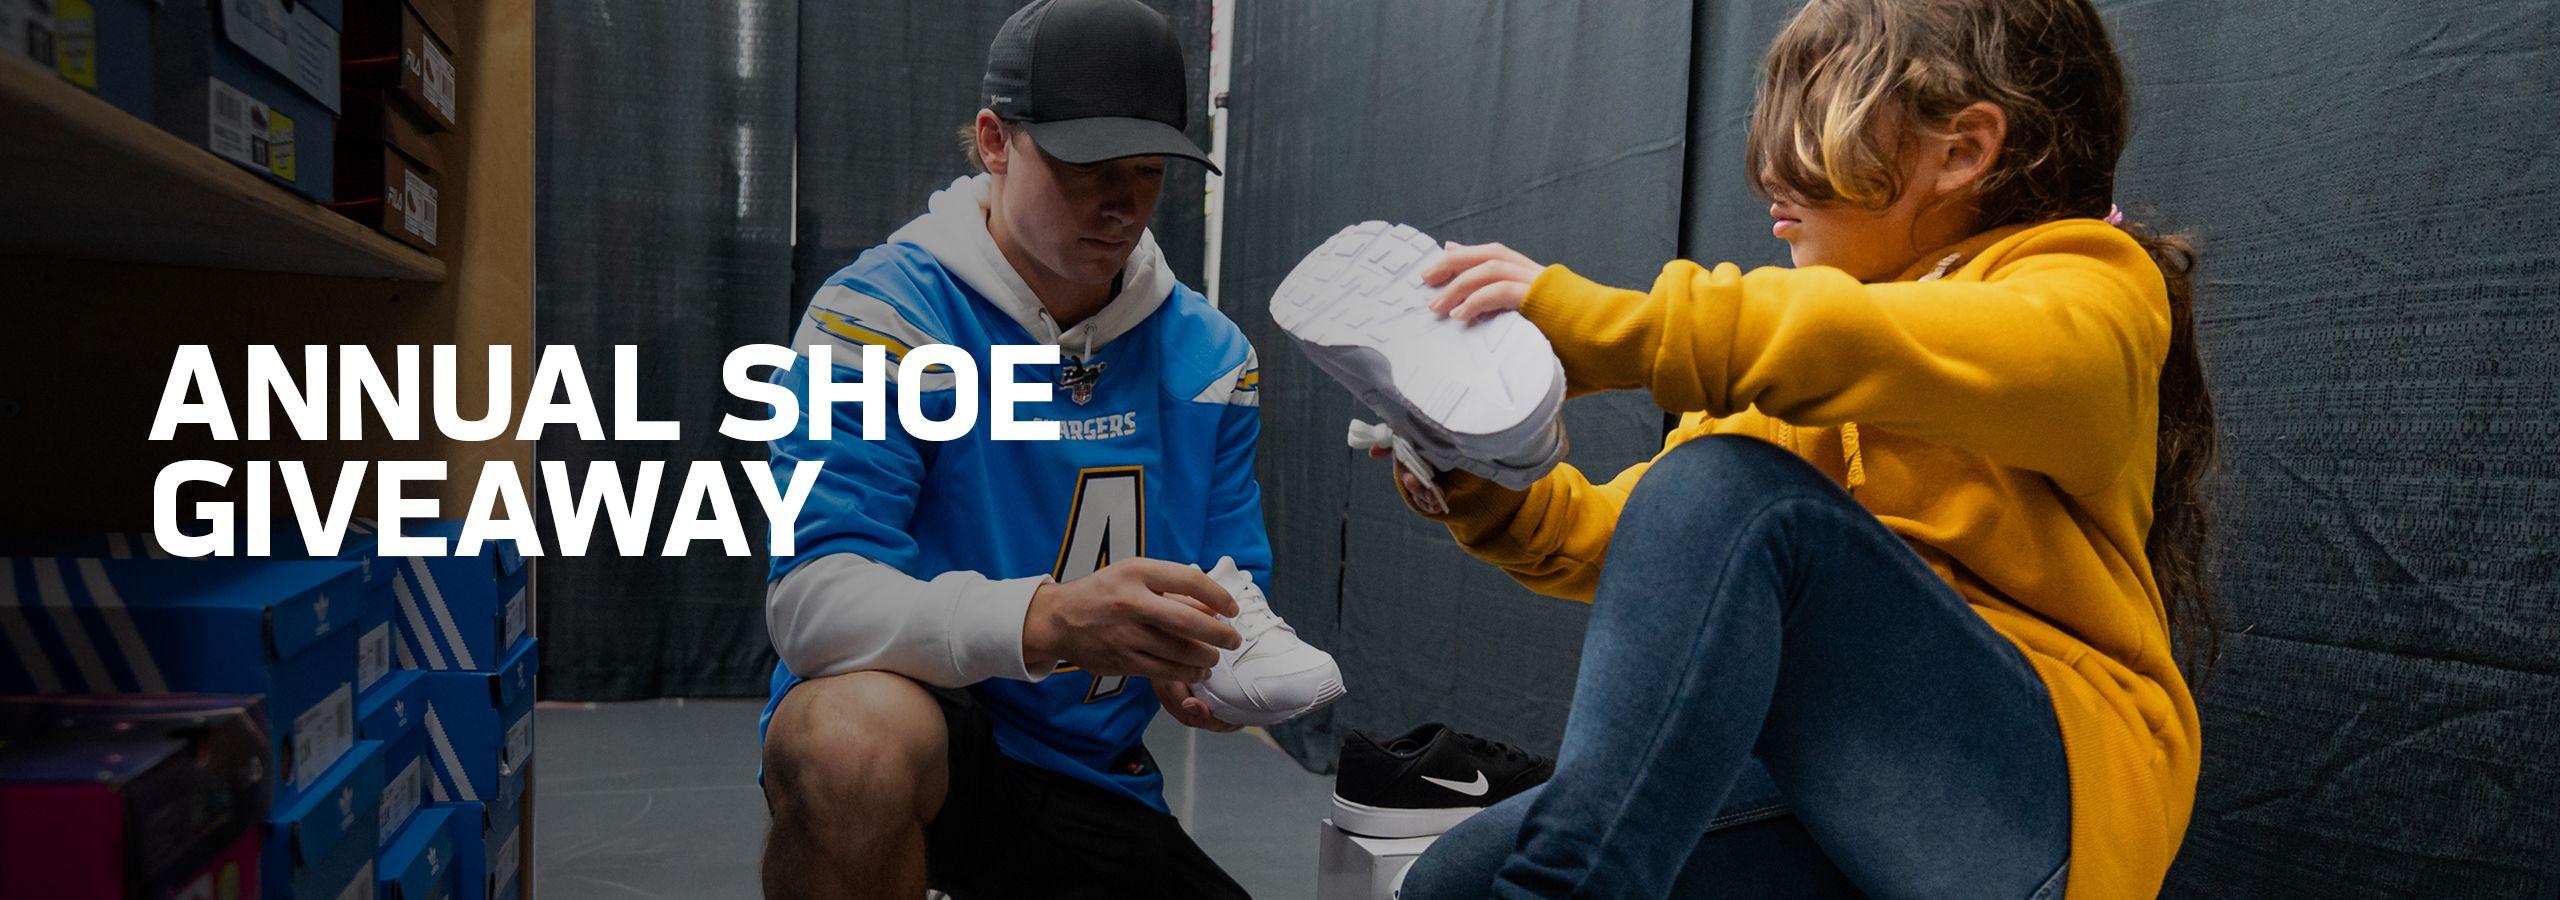 200127_Site_Header_Shoe_Giveaway